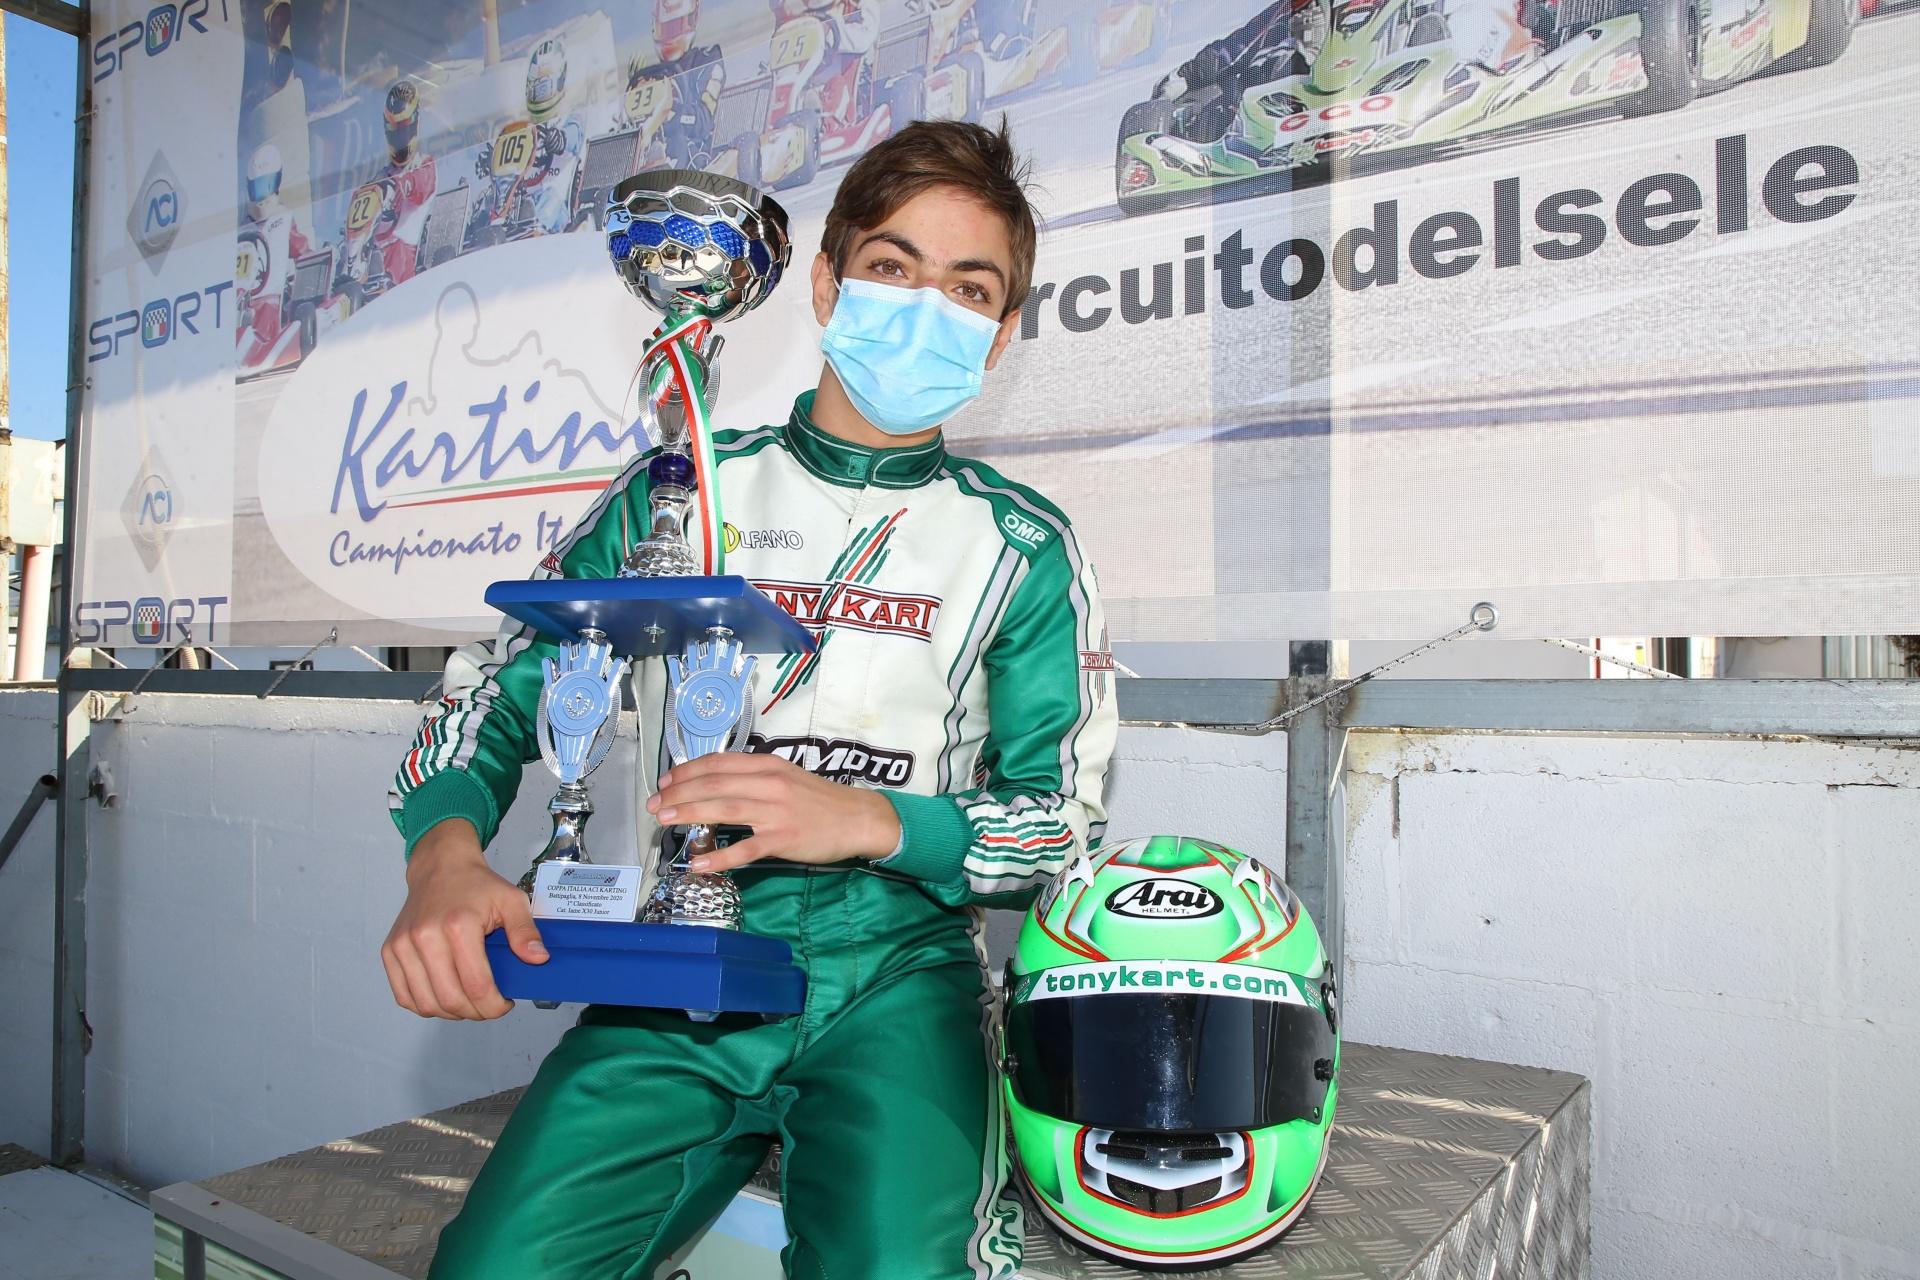 Gamoto Kart wins the Coppa Italia in X30 Junior